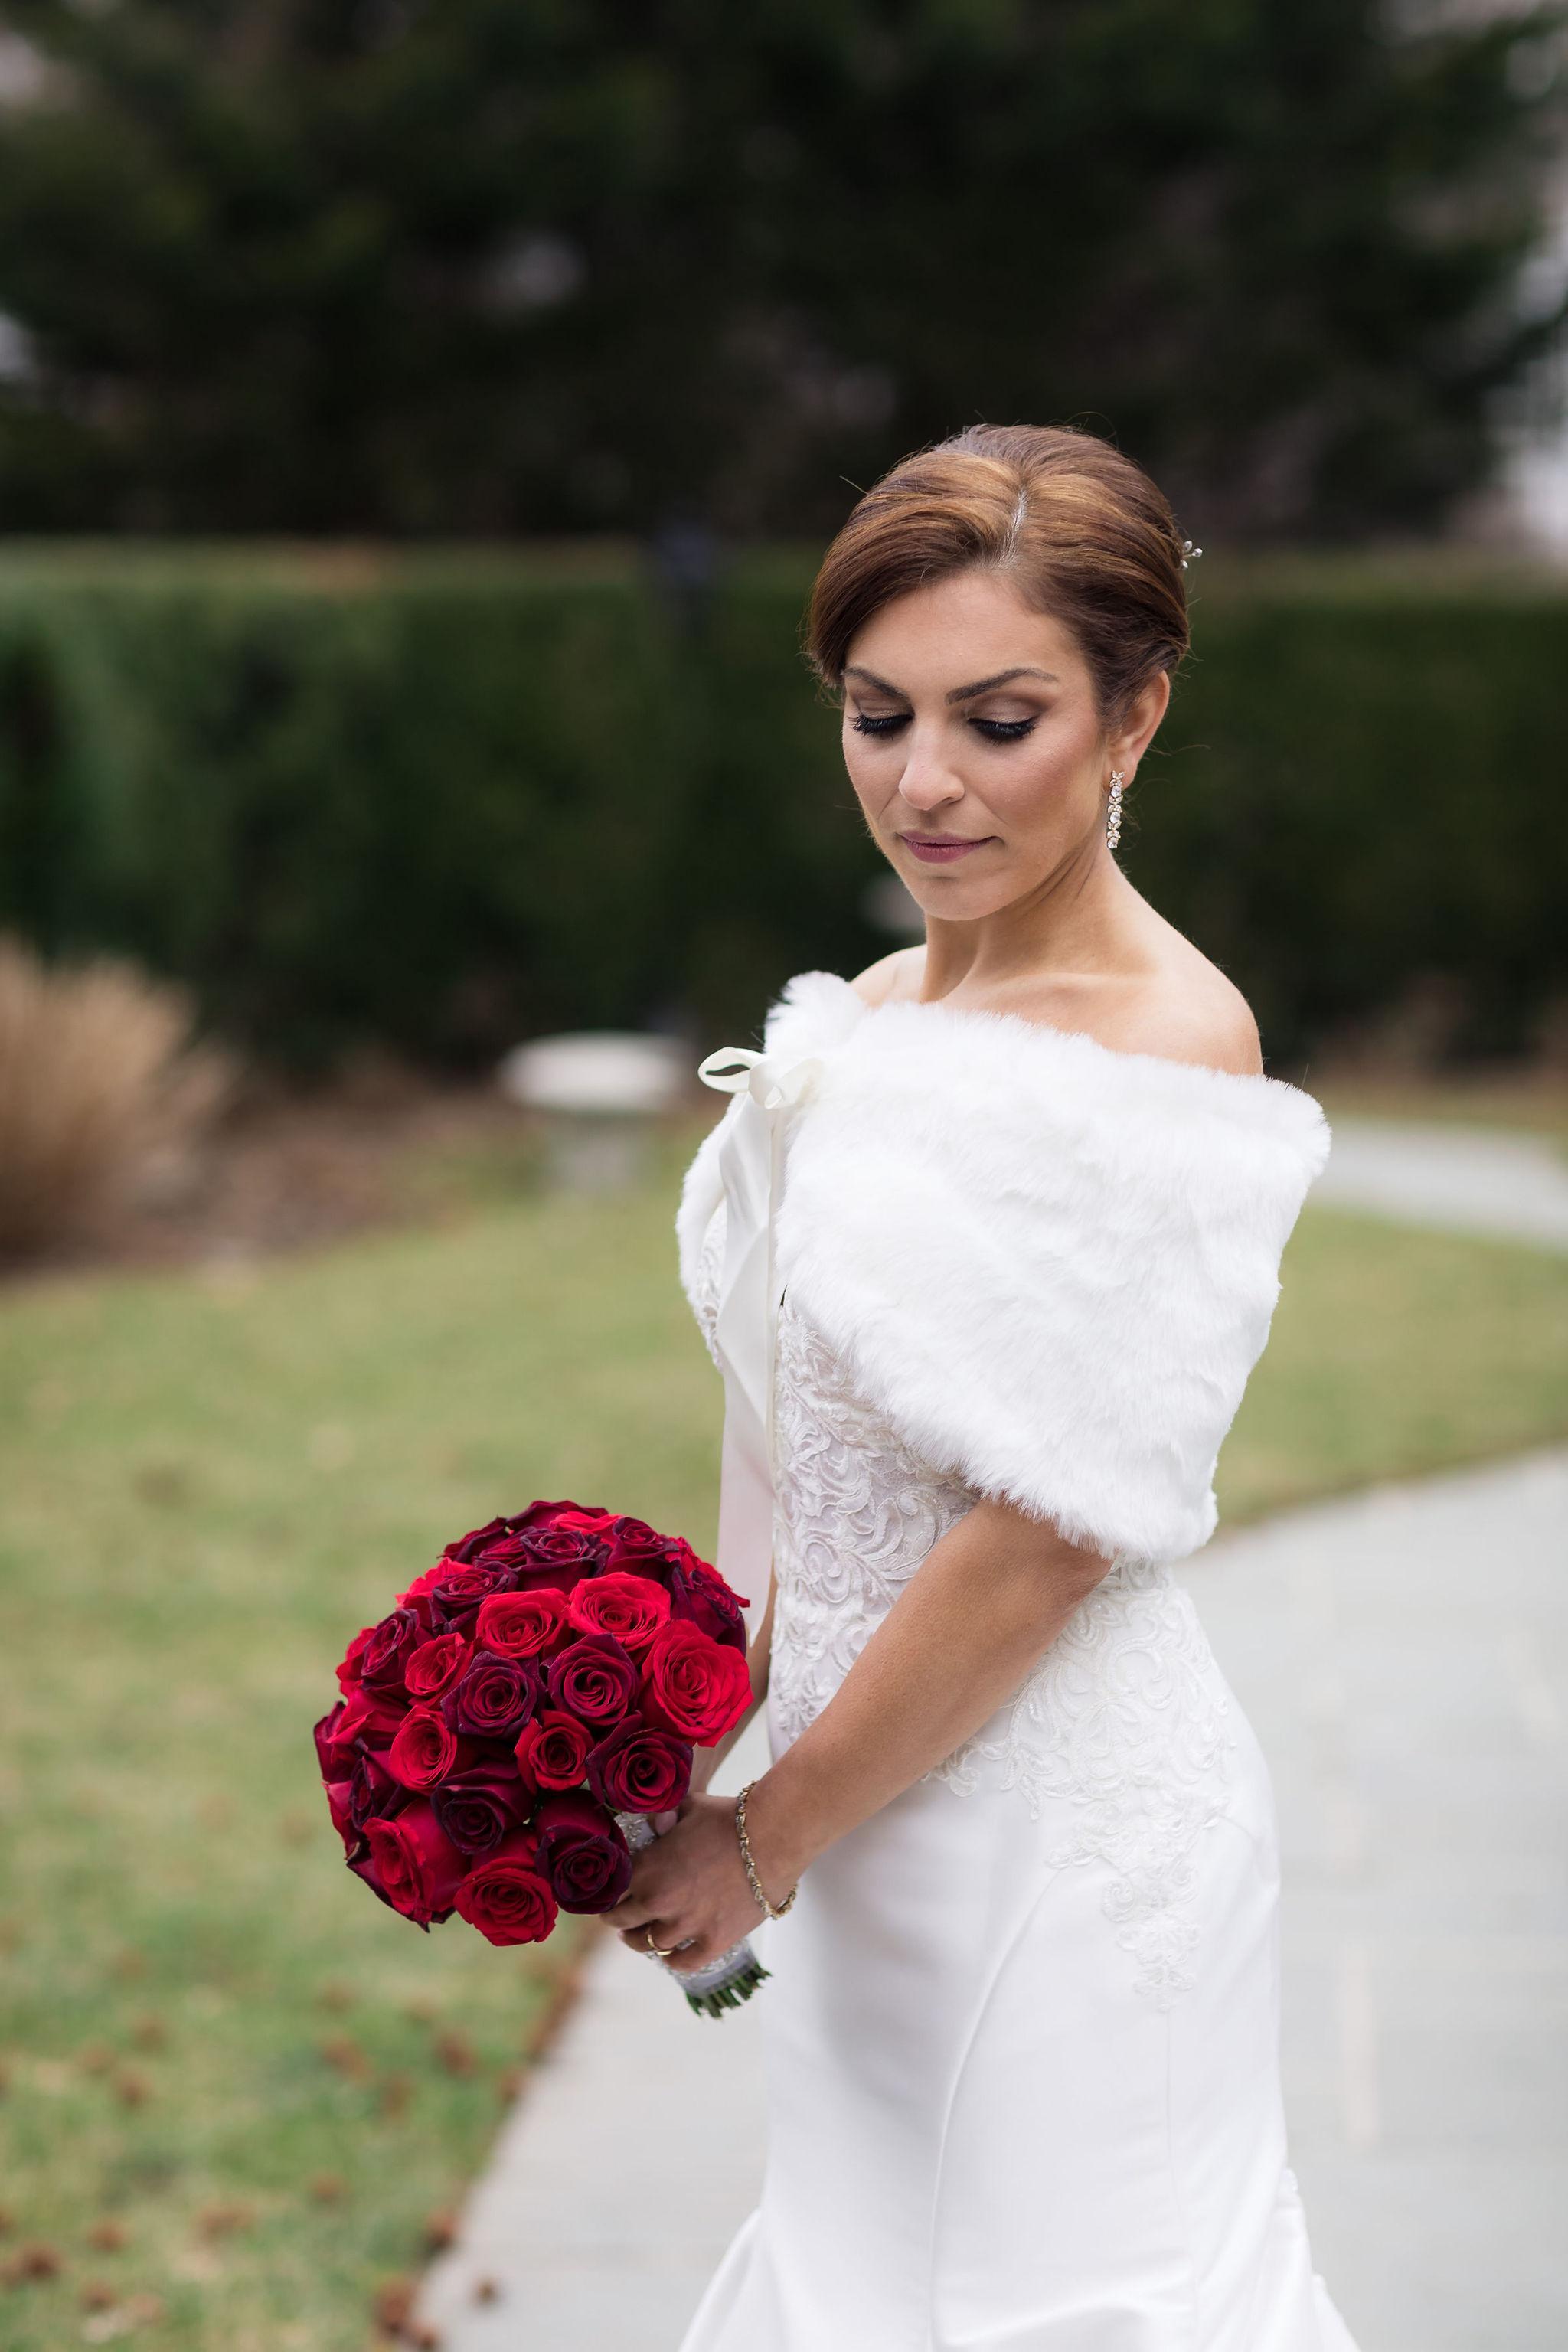 lisa-dan-wedding-getting-ready-lisa-68.JPG